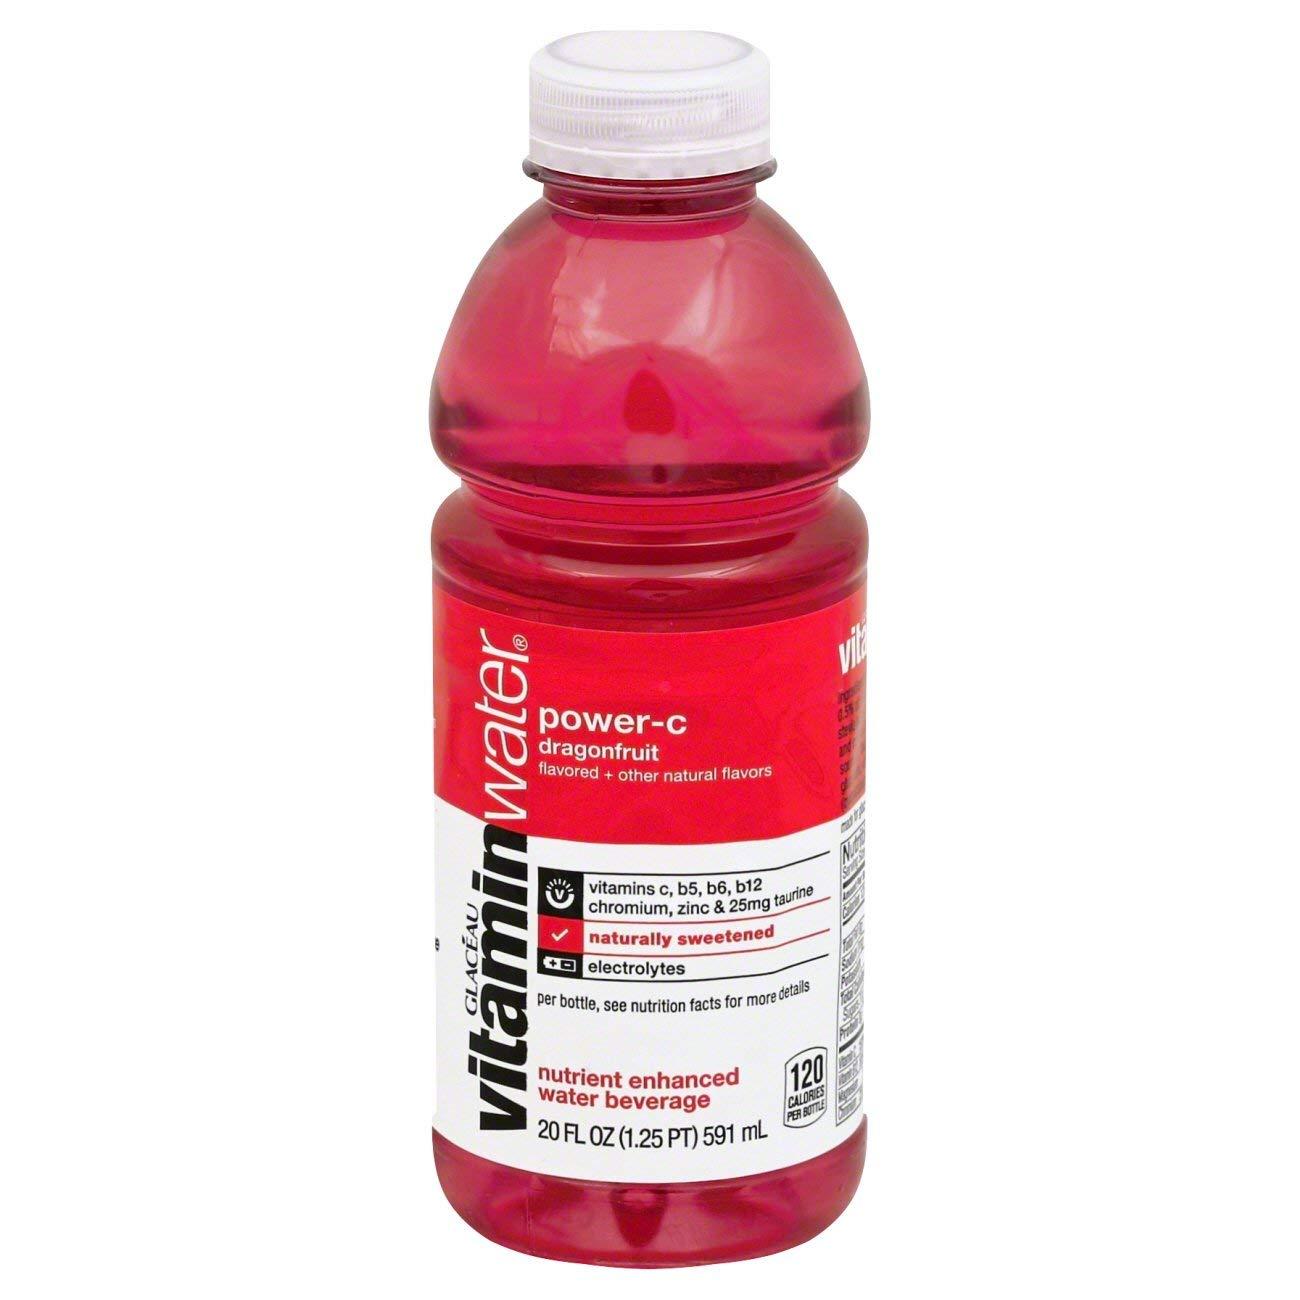 vitaminwater zero power-c, dragonfruit flavored, electrolyte enhanced bottled water with vitamin b5, b6, b12, 20 fl oz, 12 pack